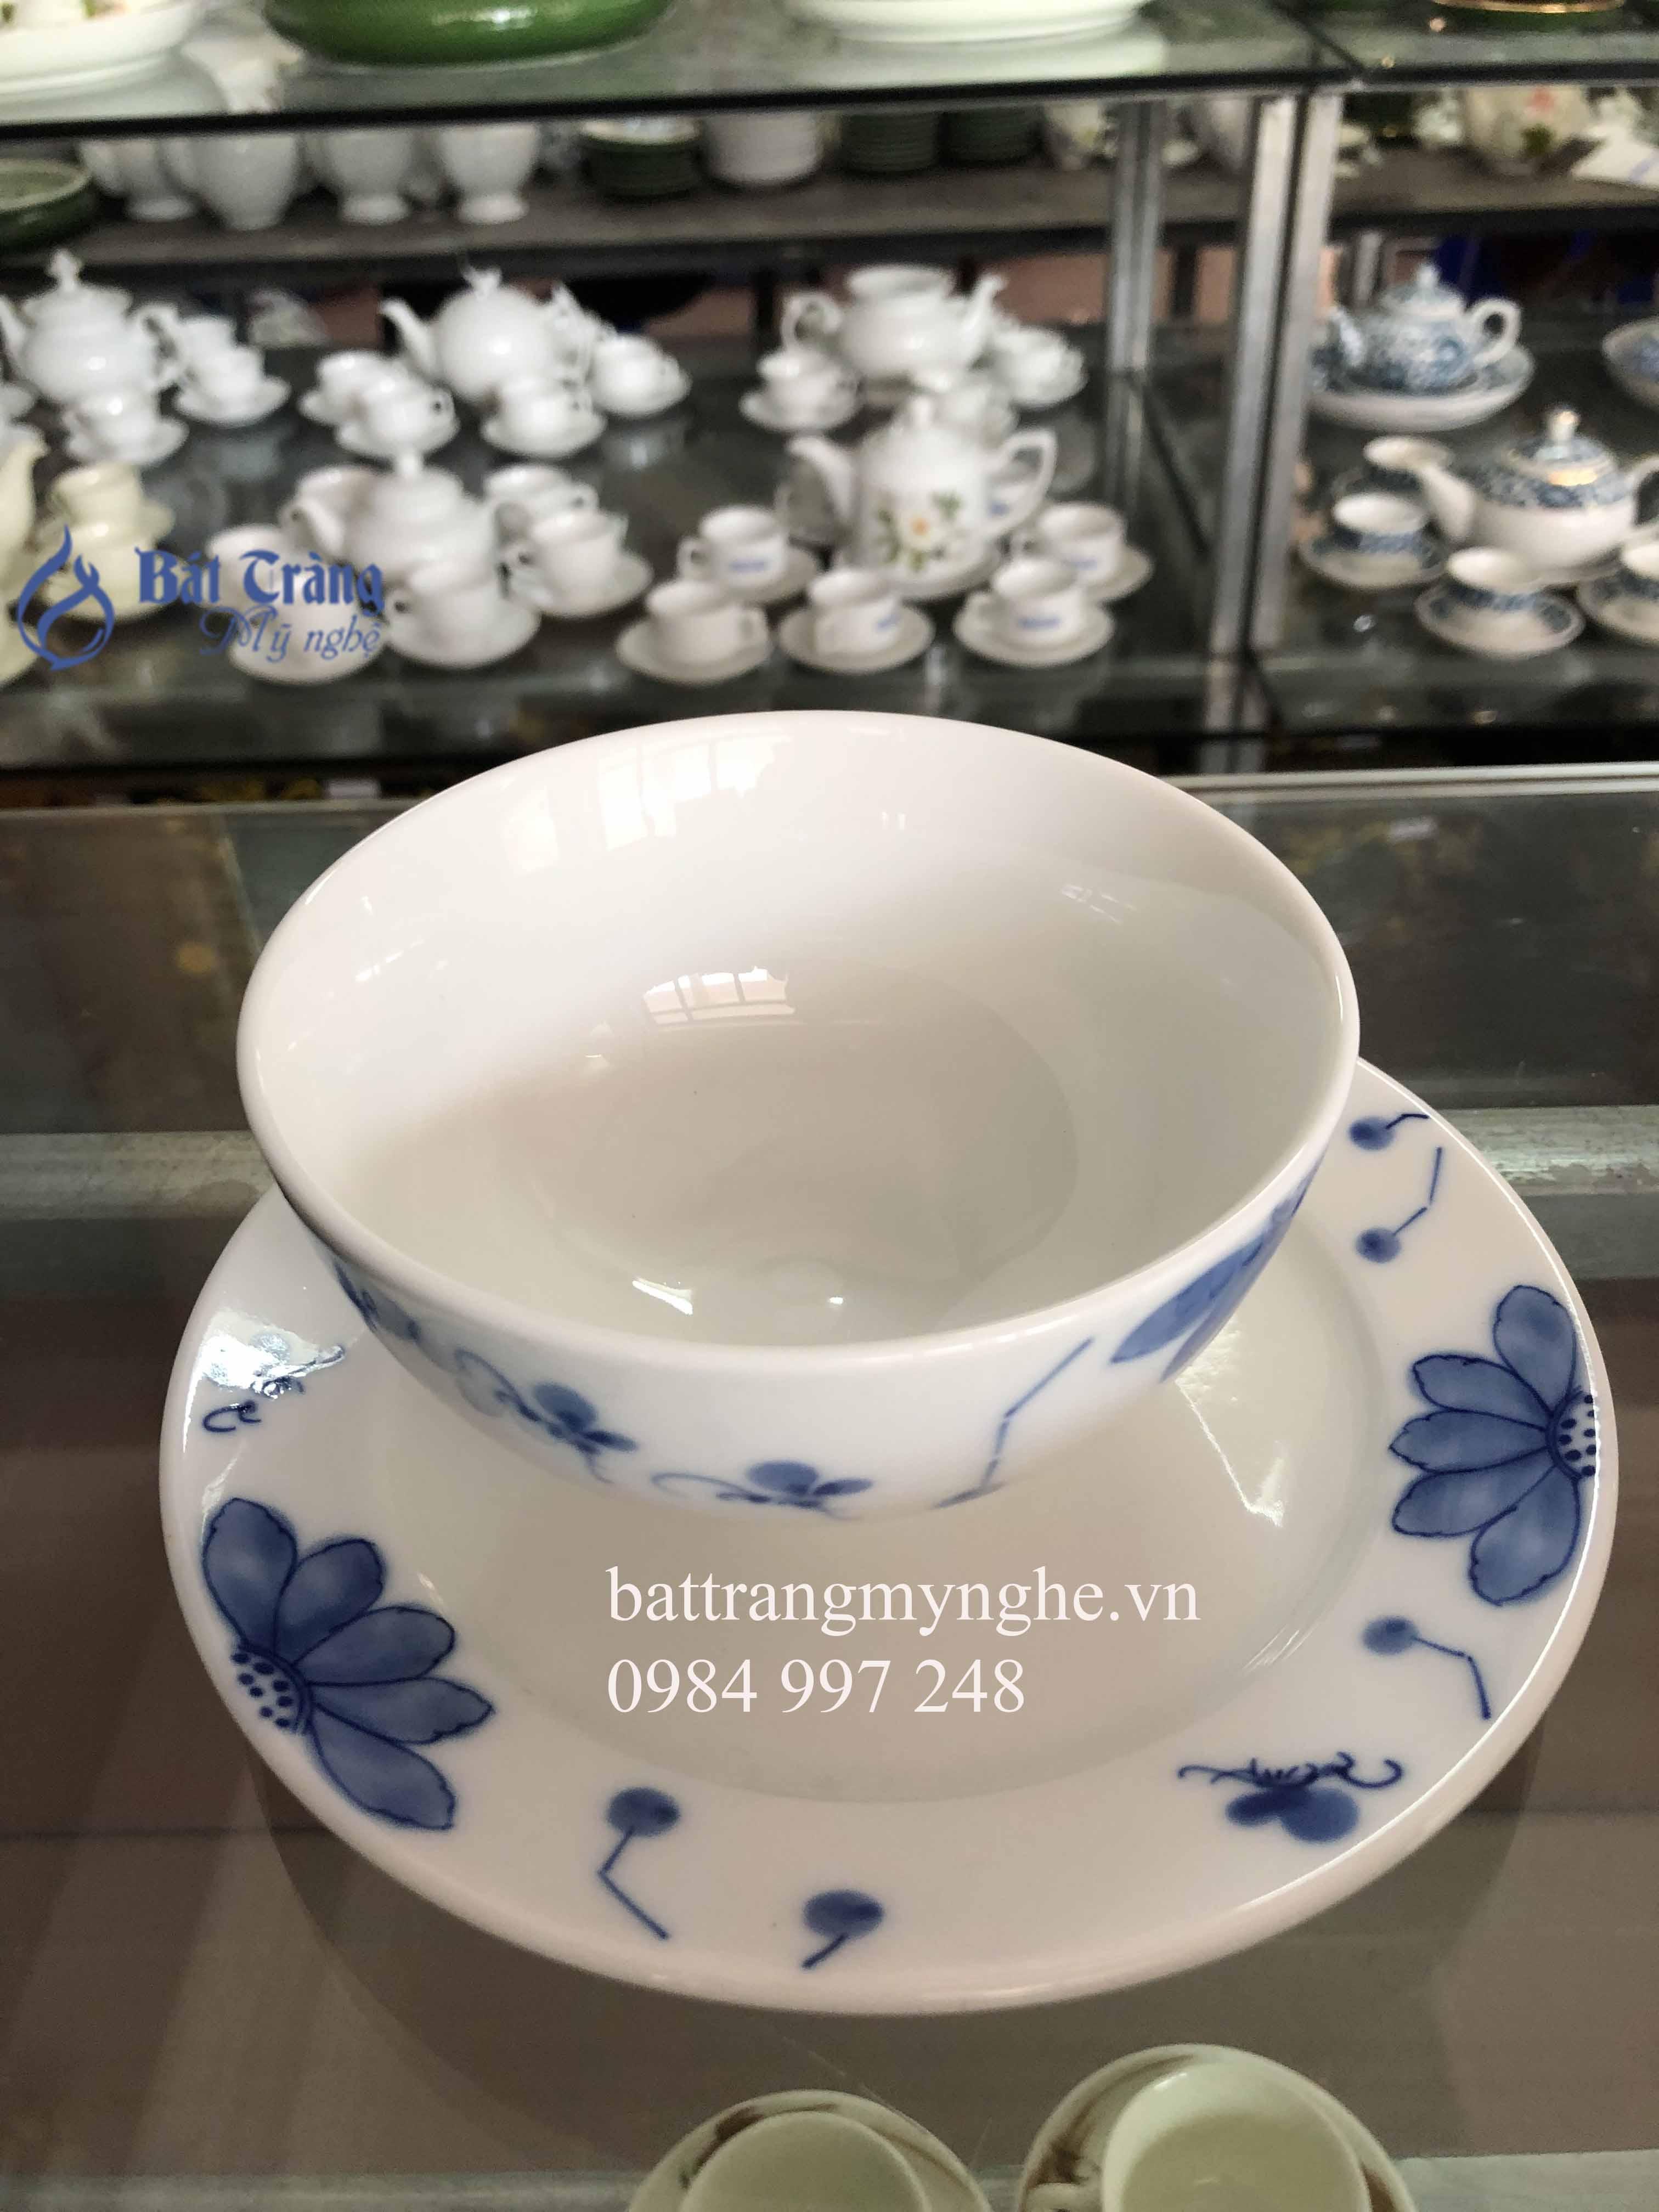 Bộ đồ ăn men trắng vẽ hoa sen xanh cao cấp